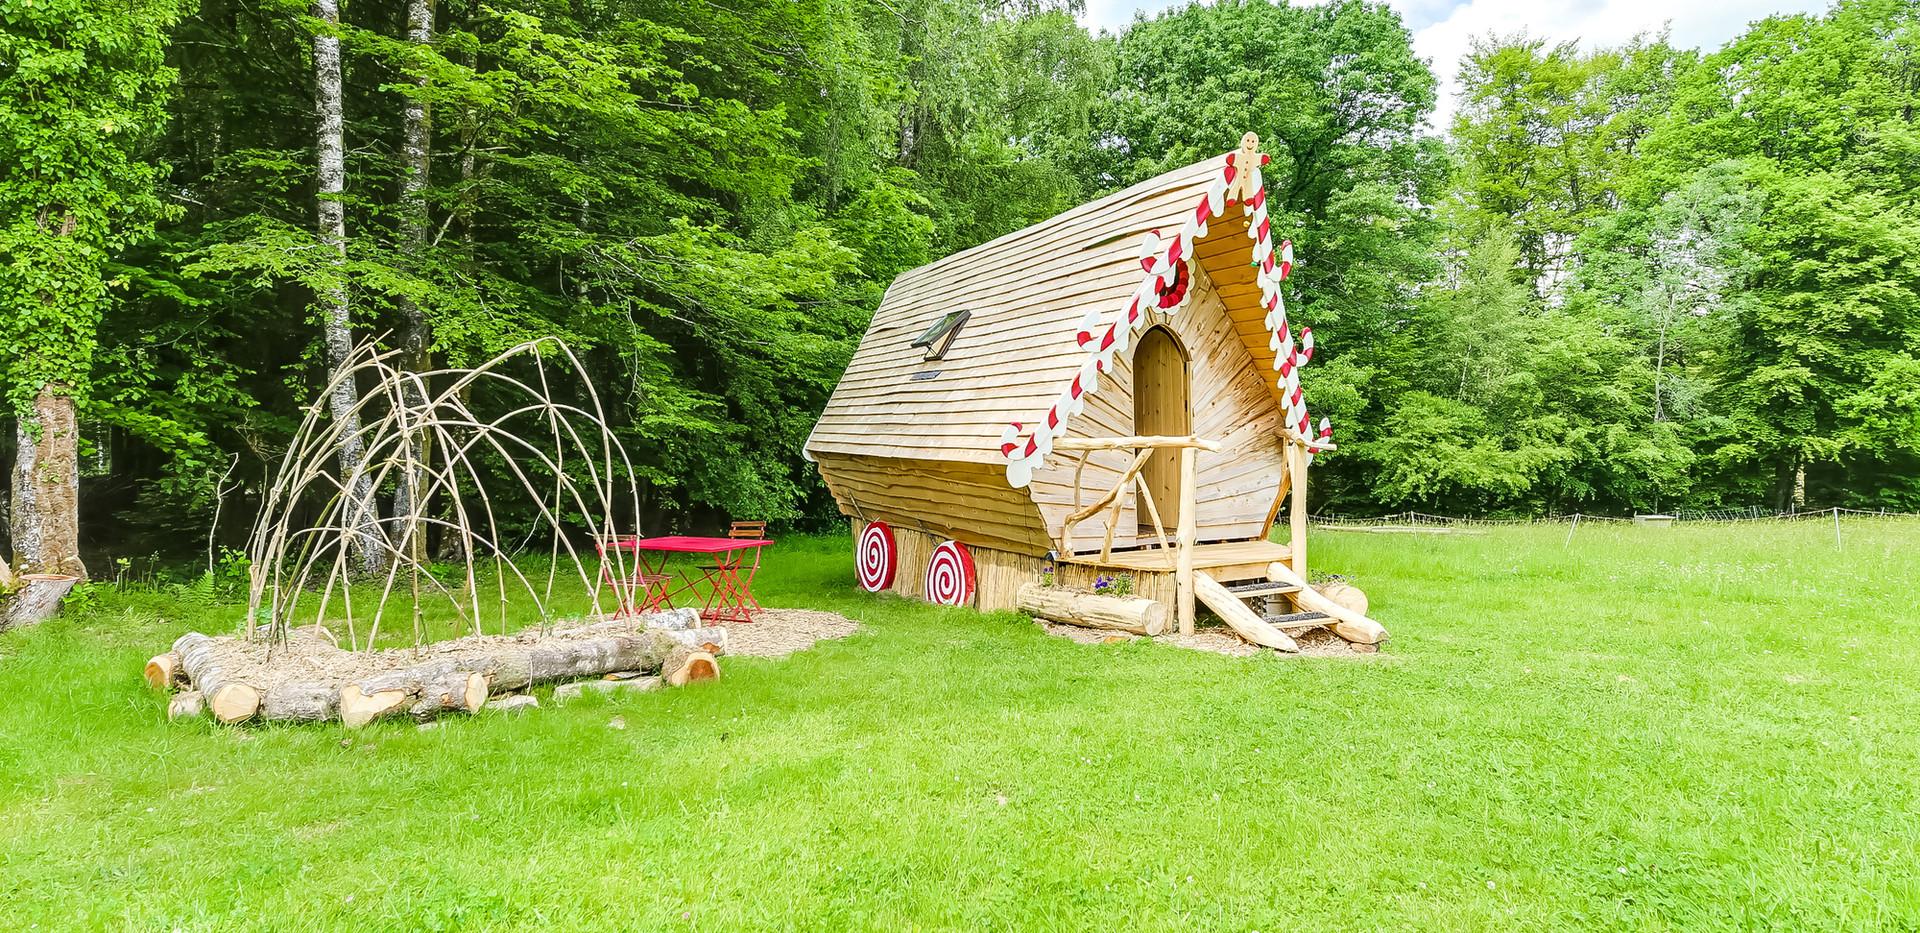 Hansel and gretel hut